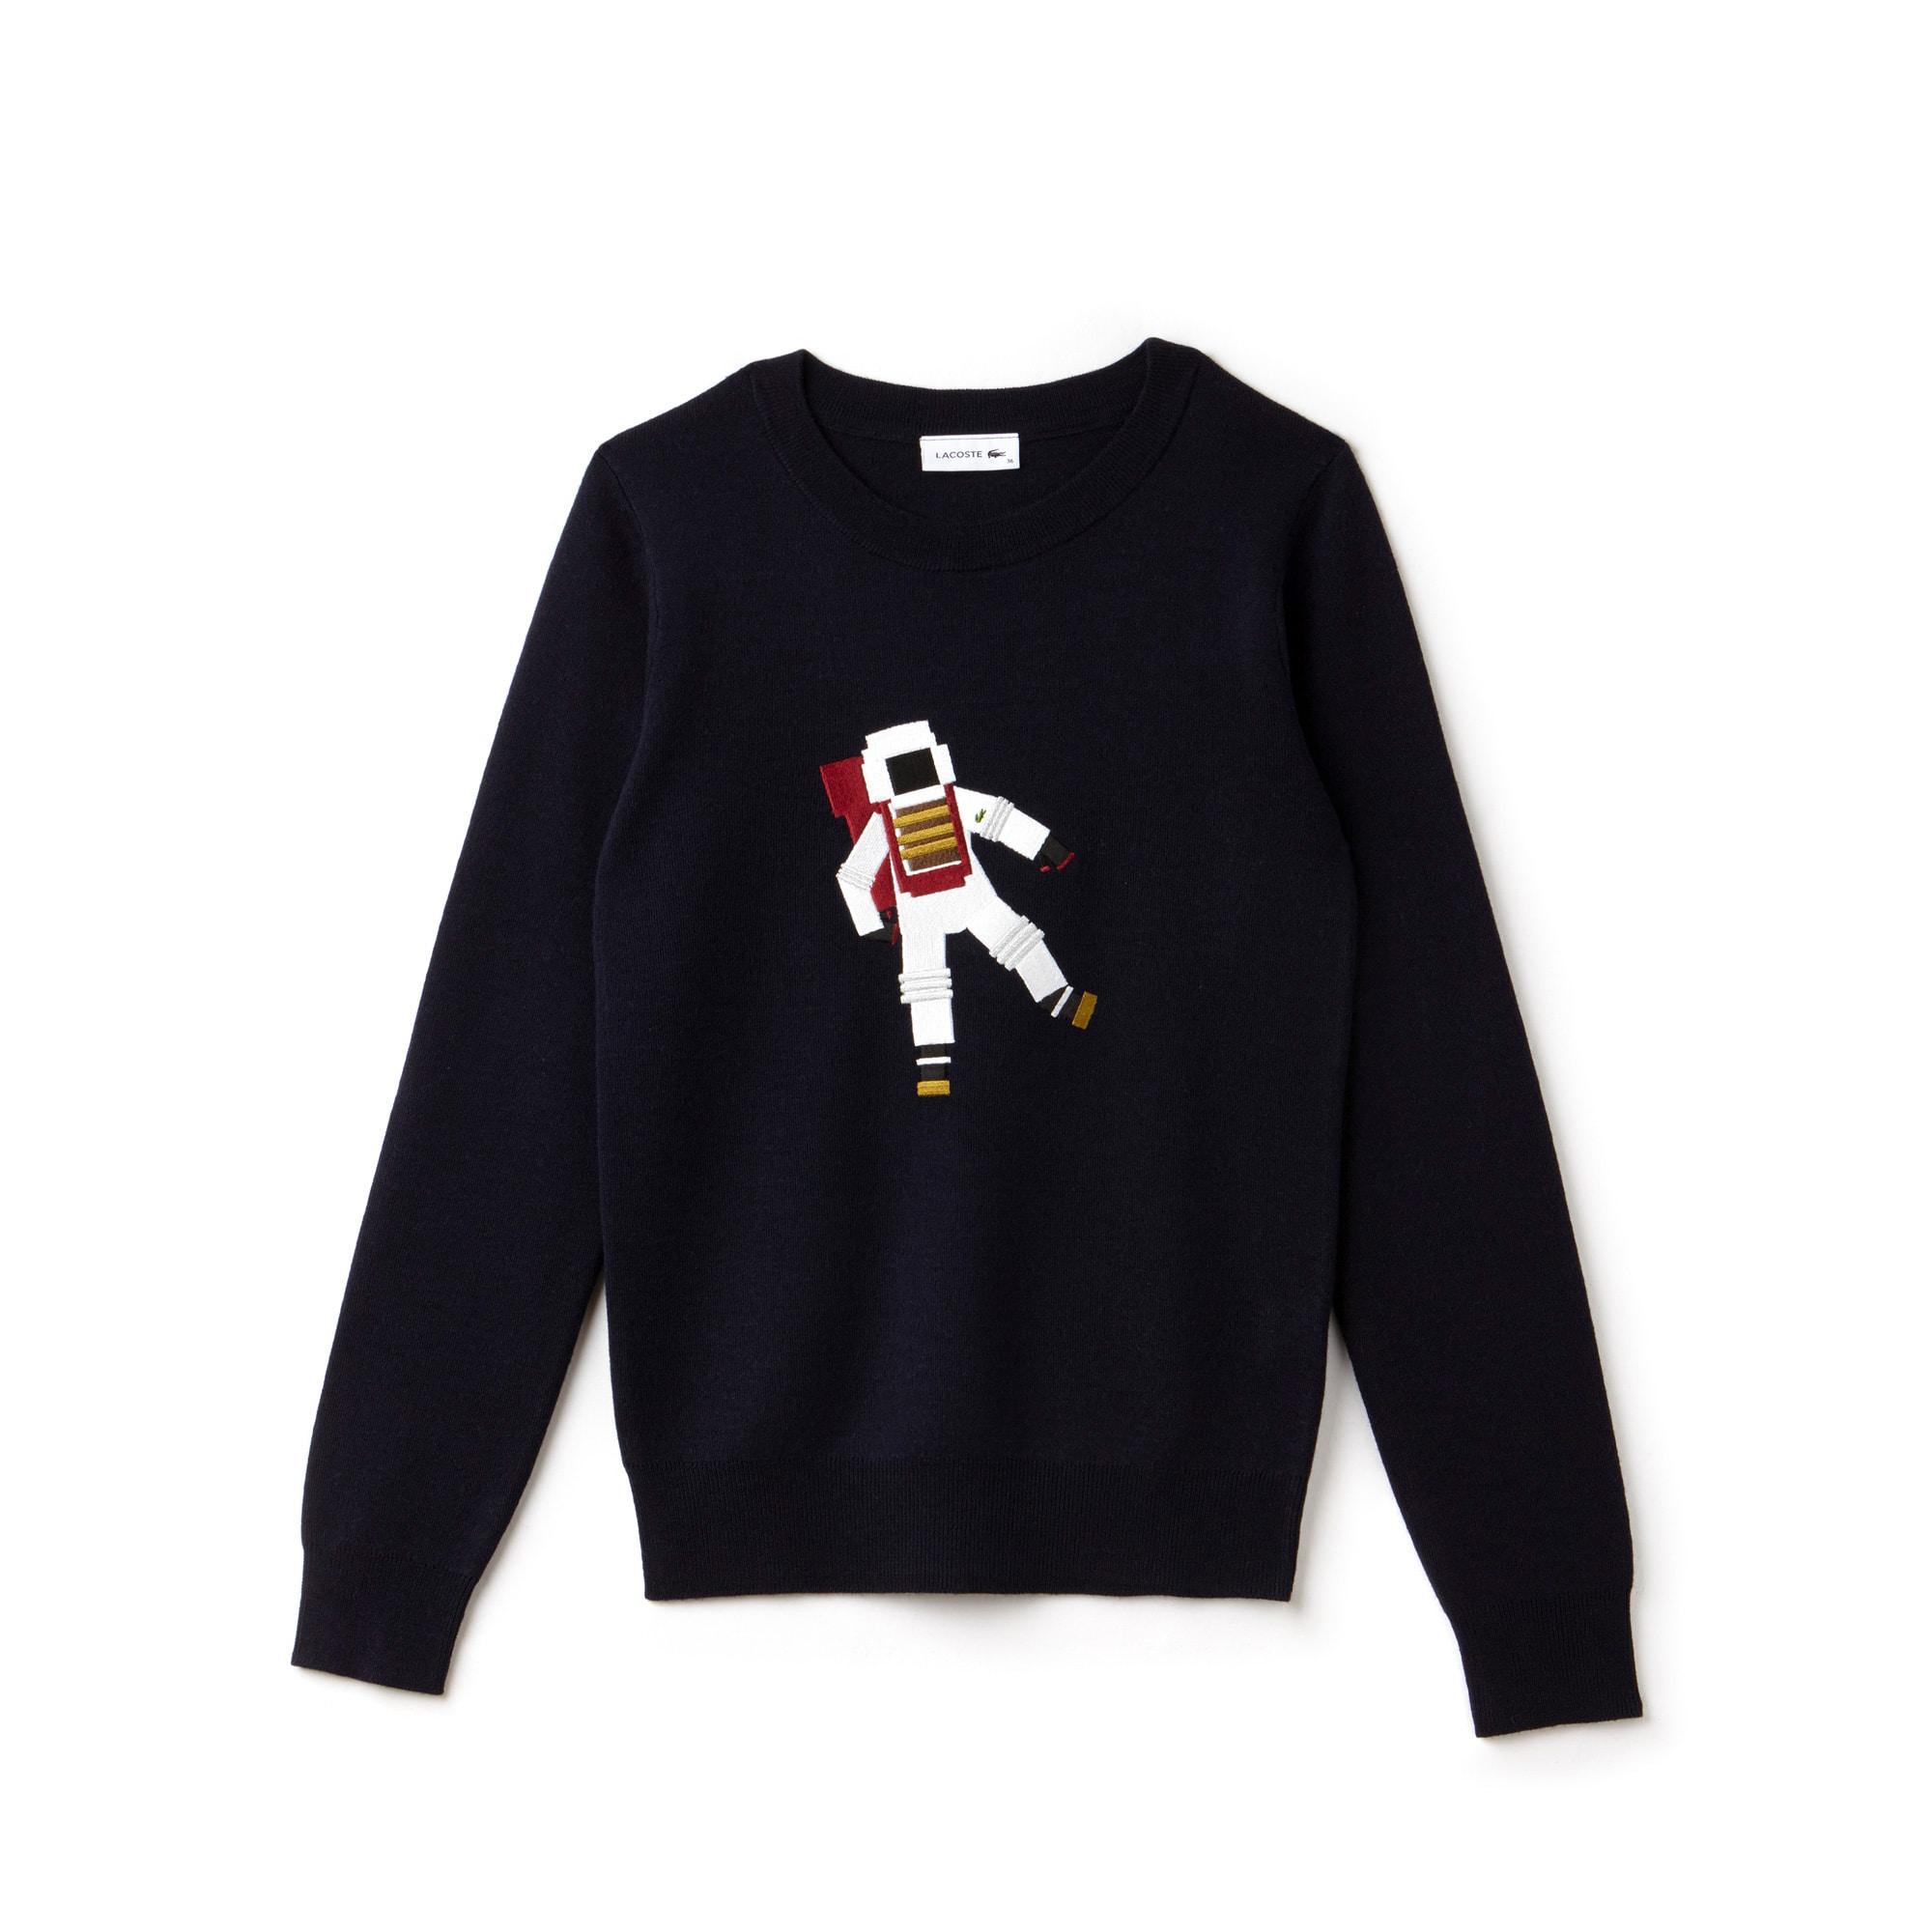 Women's Crew Neck Astronaut Embroidery Wool Interlock Sweater